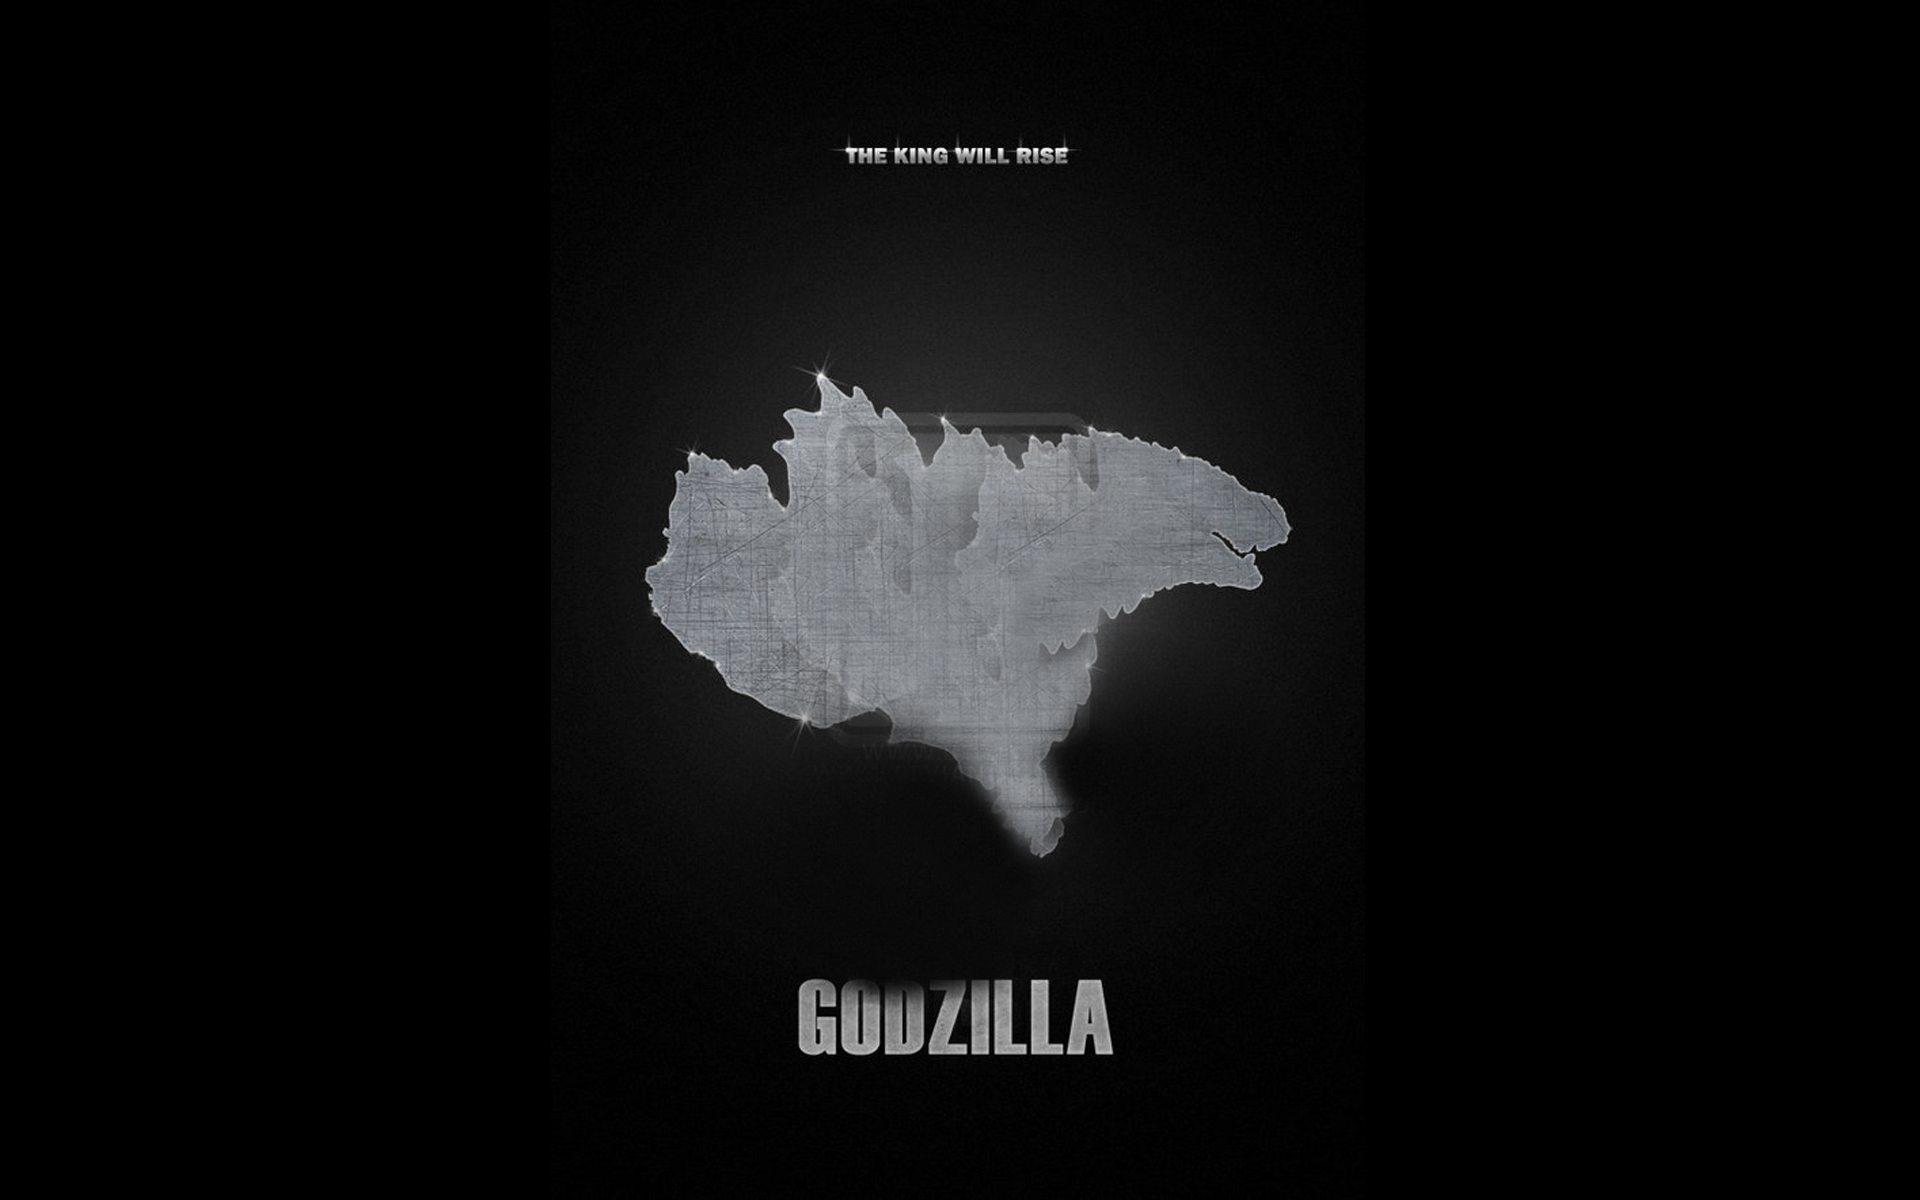 Godzilla (VoicesFILM) [1920 x 1200] (3)